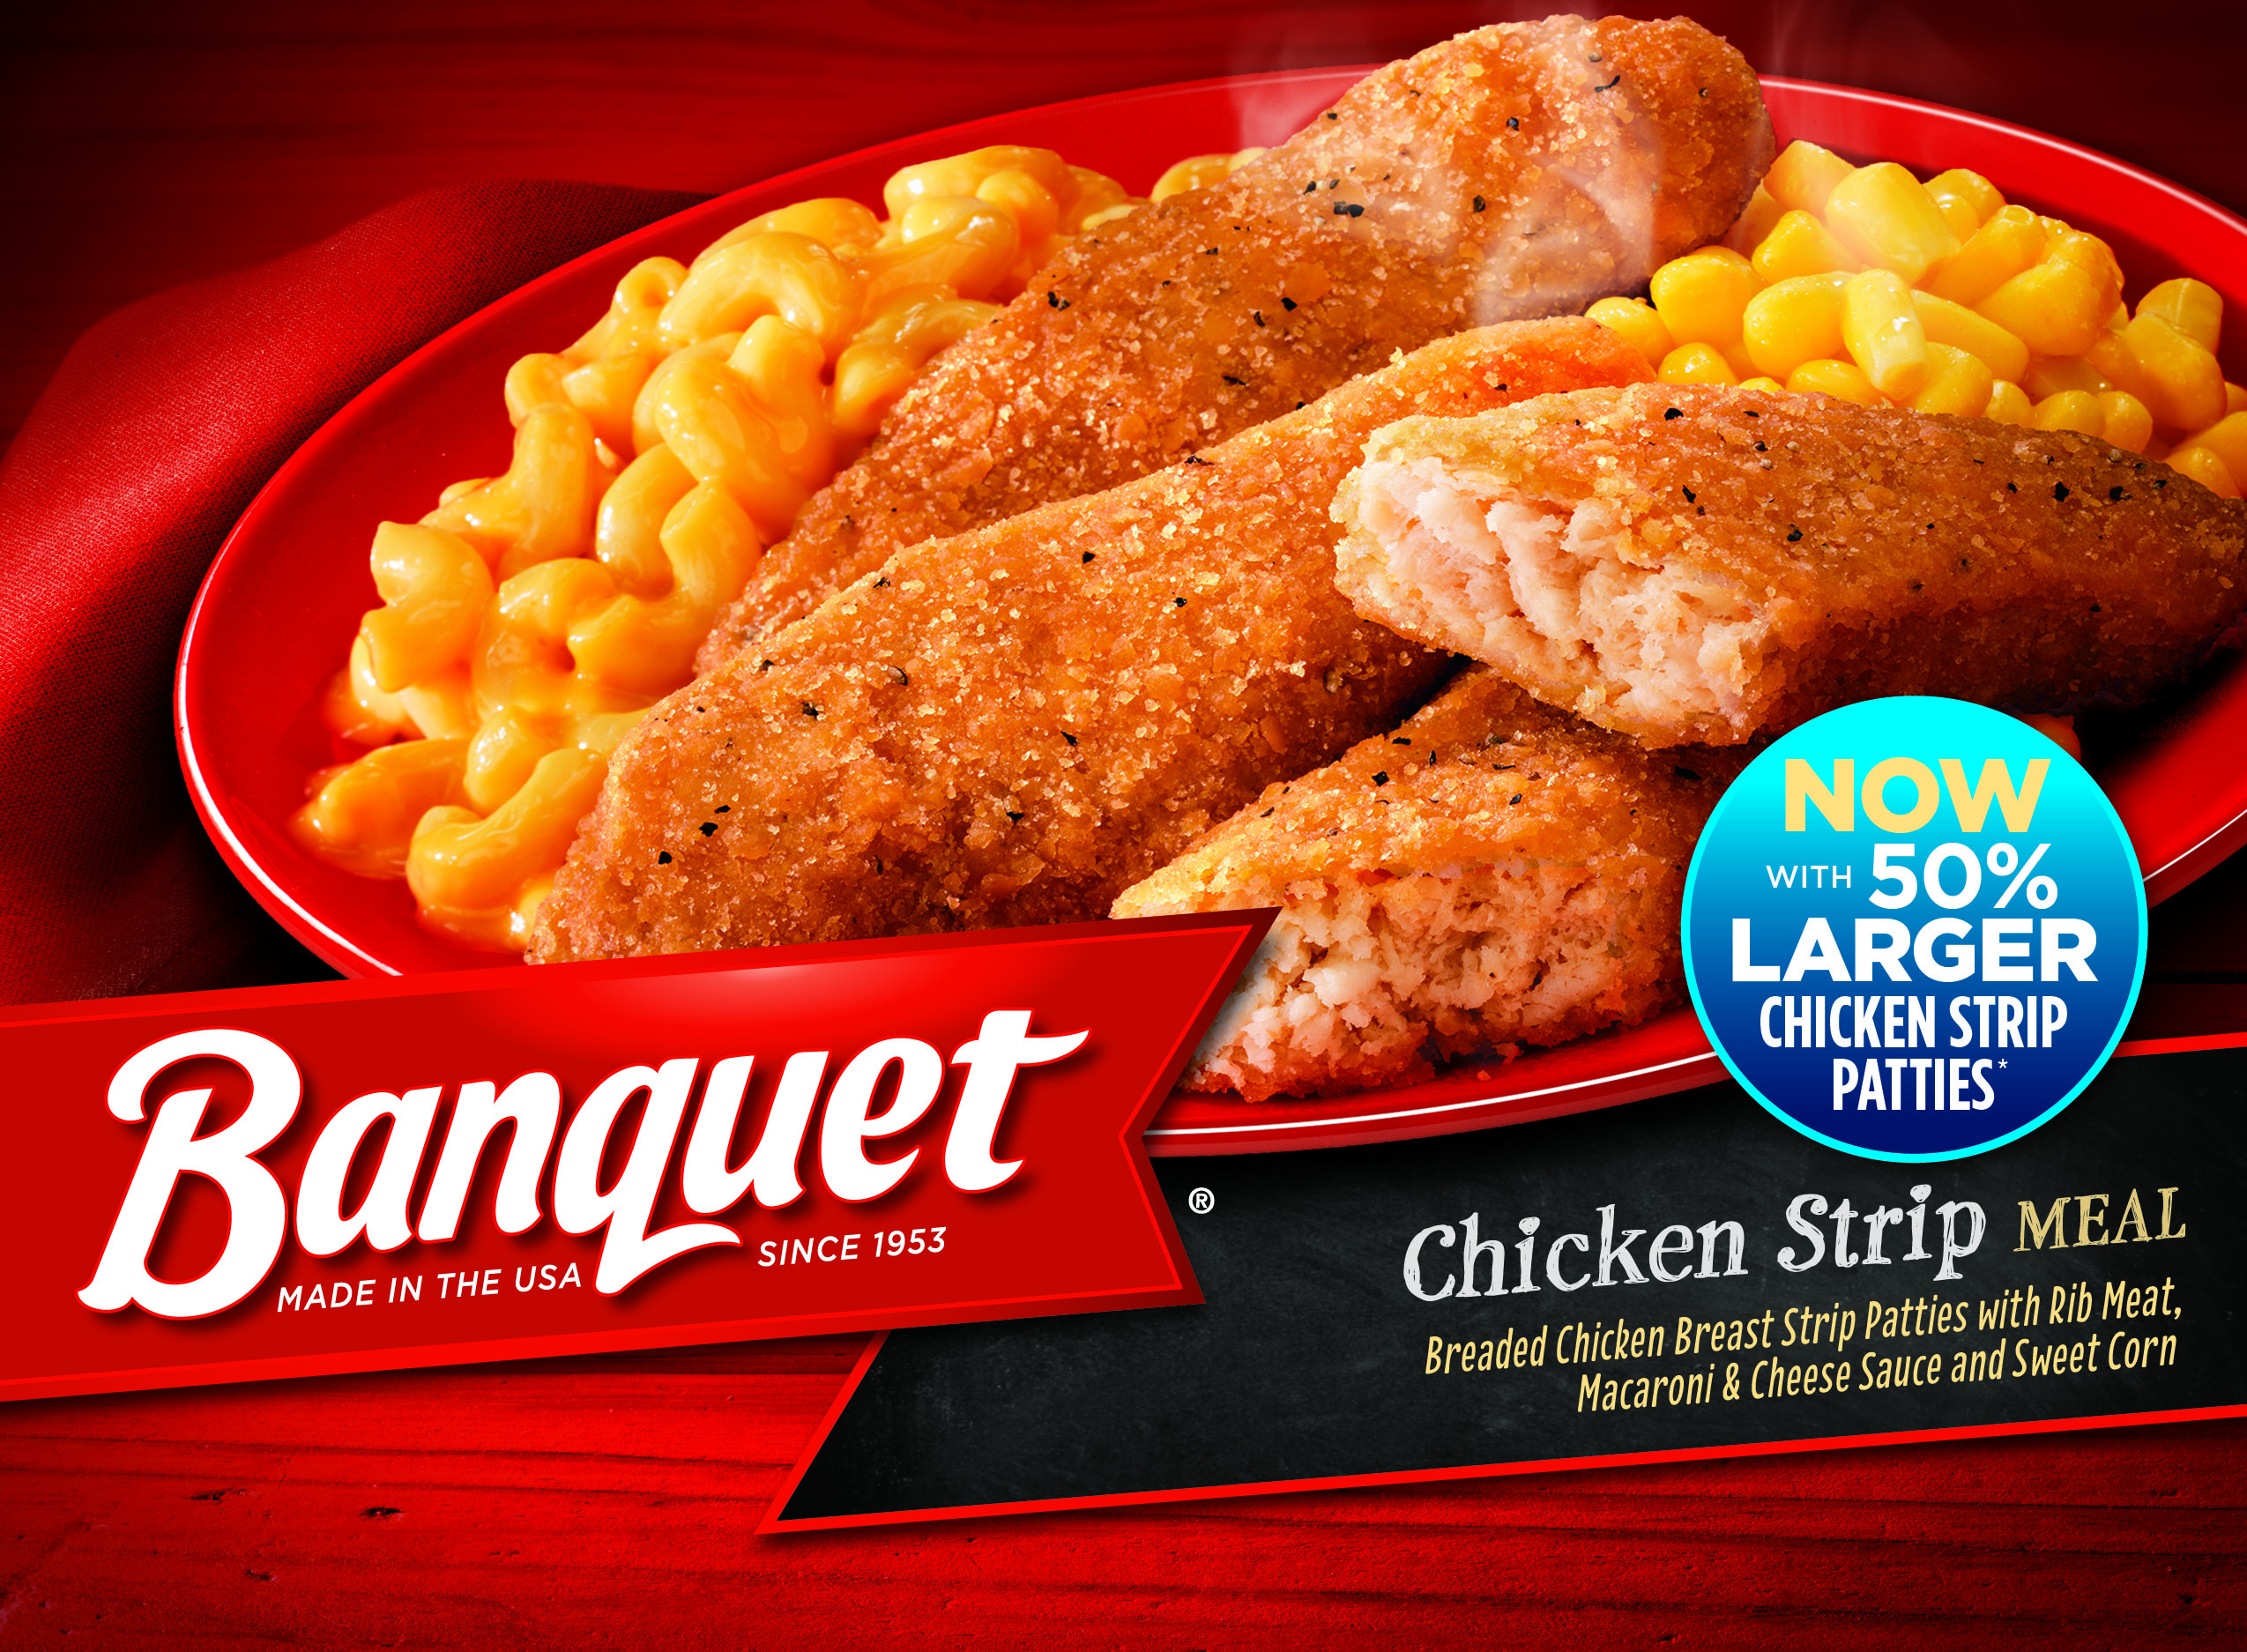 Banquet Frozen Dinners  Banquet Makes Improvements to Frozen Meals